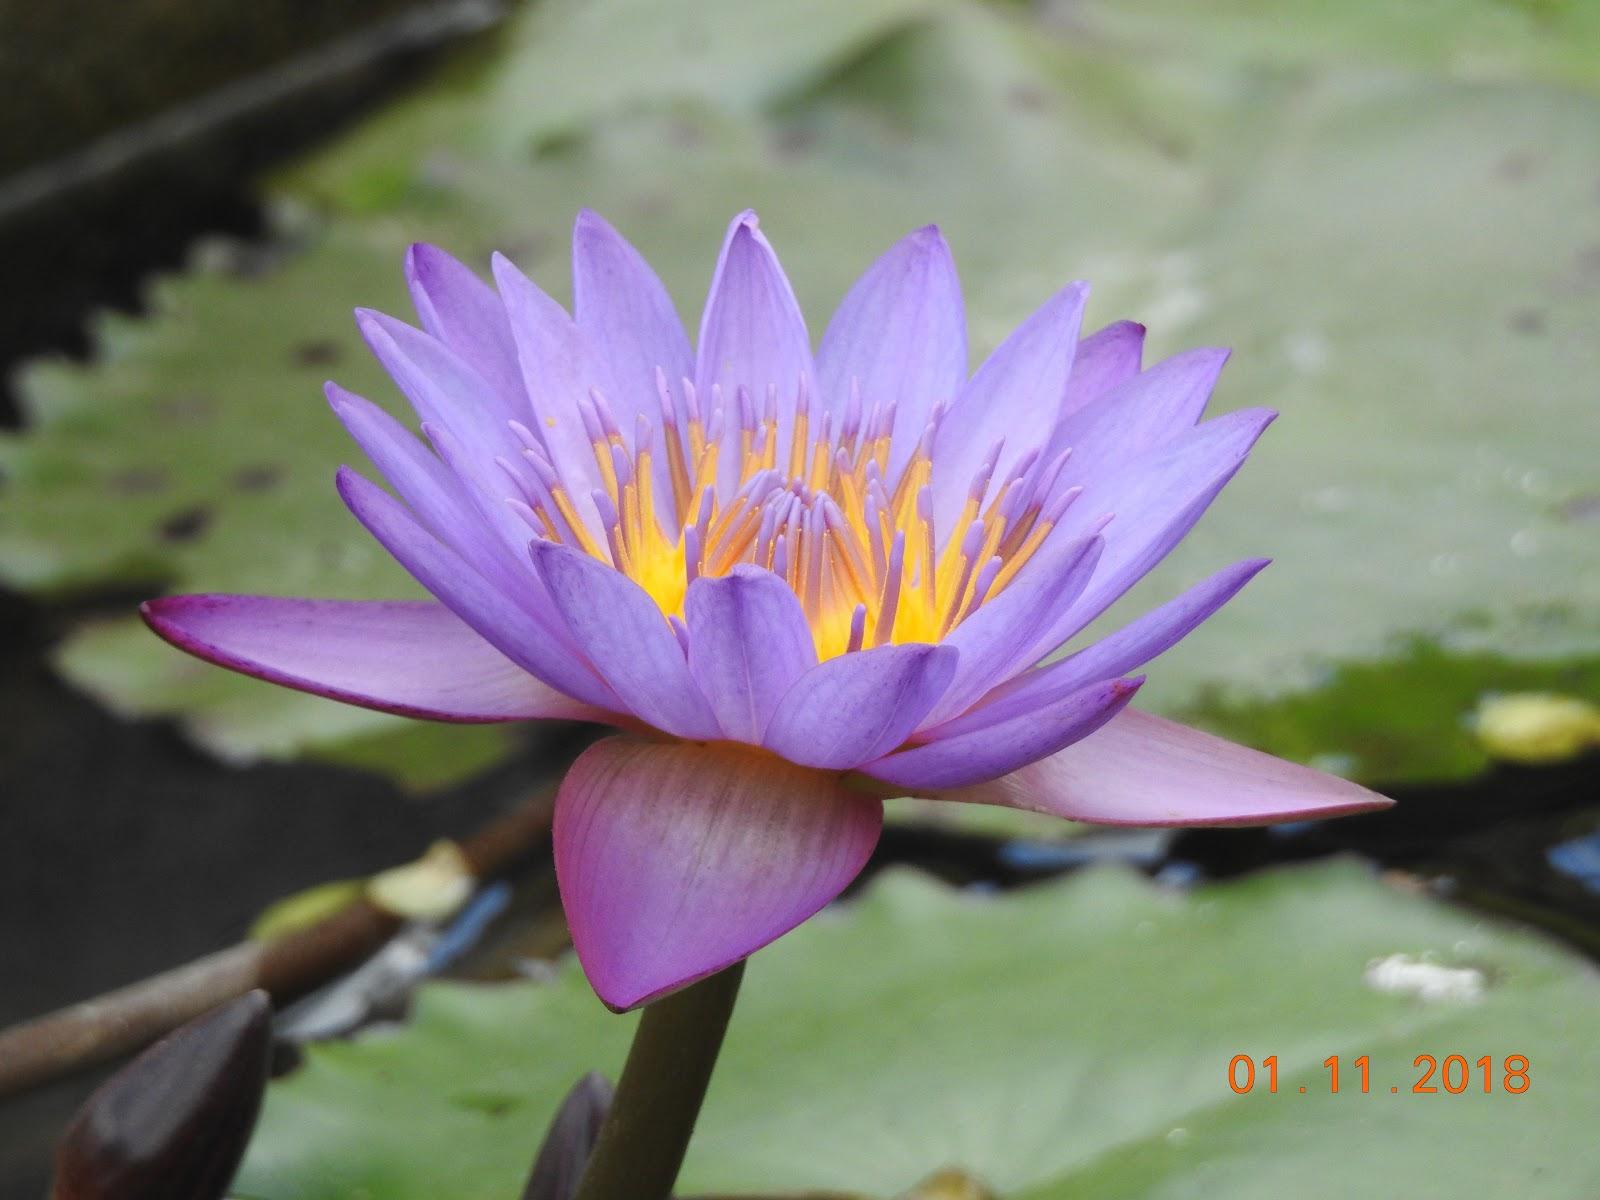 invite-to-paradise-sri-lanka-maldives-holiday-specialists-nutan-vidyut-patel-lotus-flower.jpg